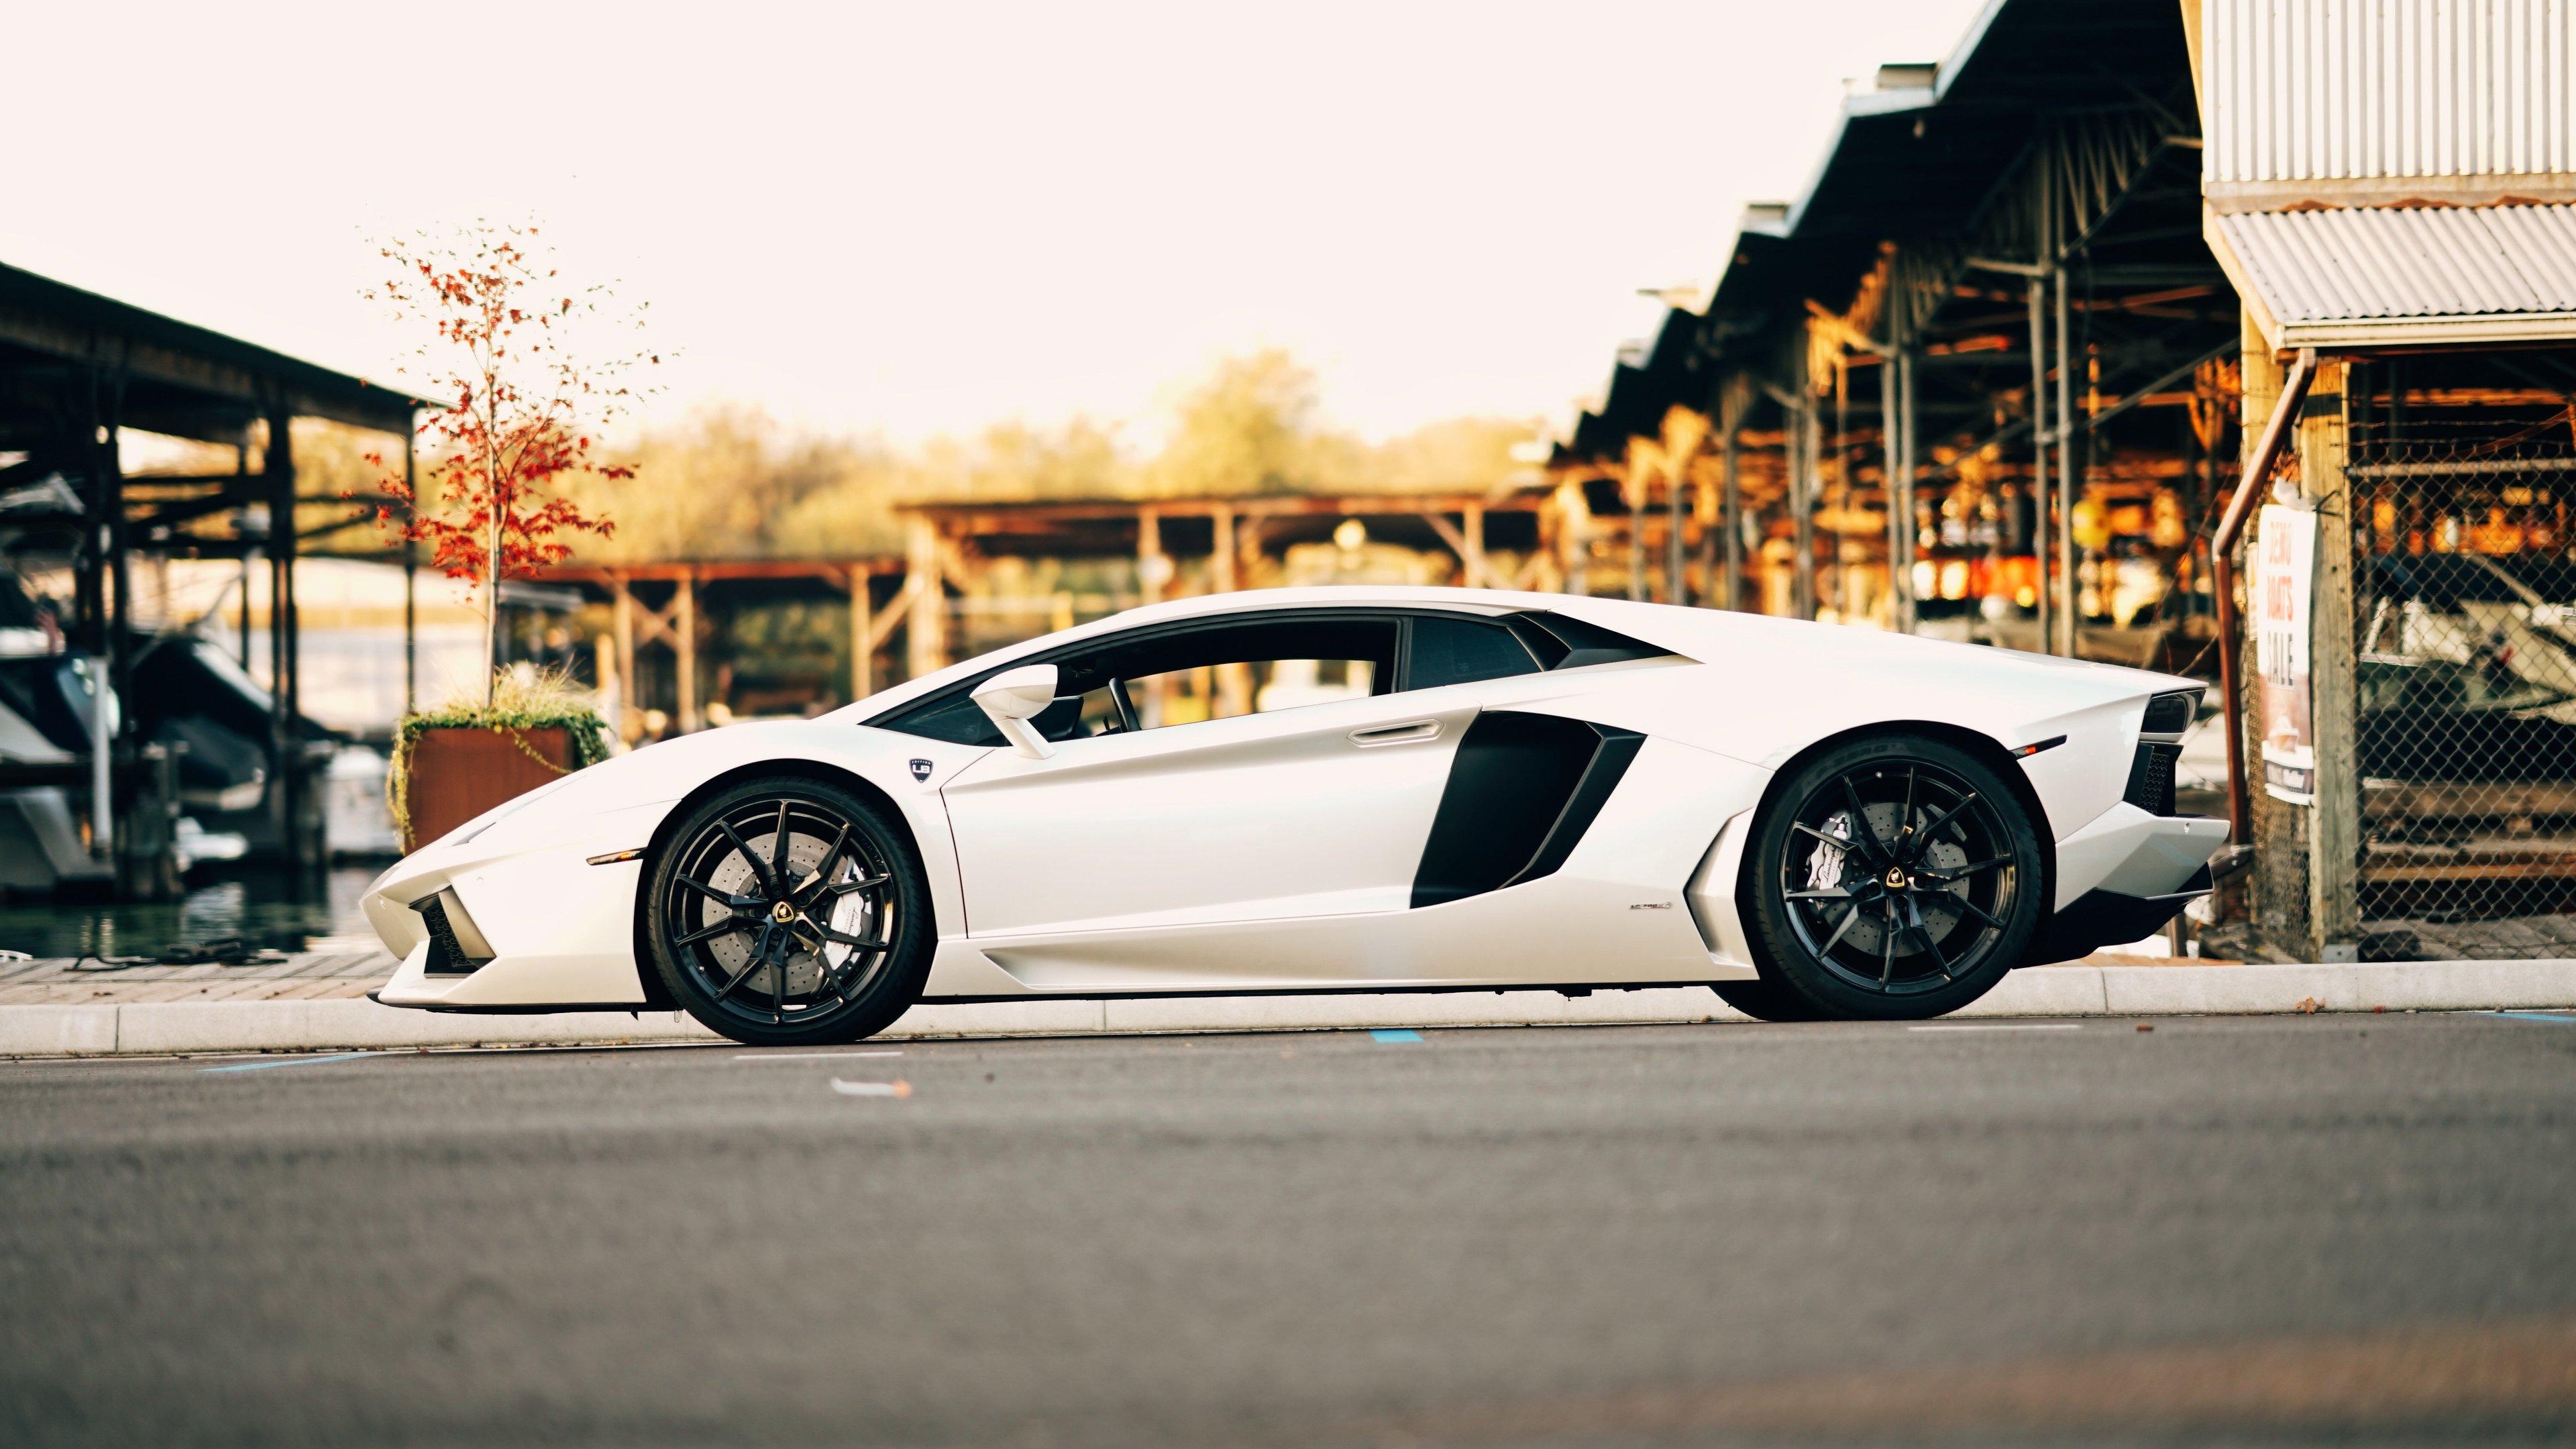 lamborghini aventador 4k 2019 1559764570 - Lamborghini Aventador 4k 2019 - lamborghini wallpapers, lamborghini aventador wallpapers, hd-wallpapers, cars wallpapers, 4k-wallpapers